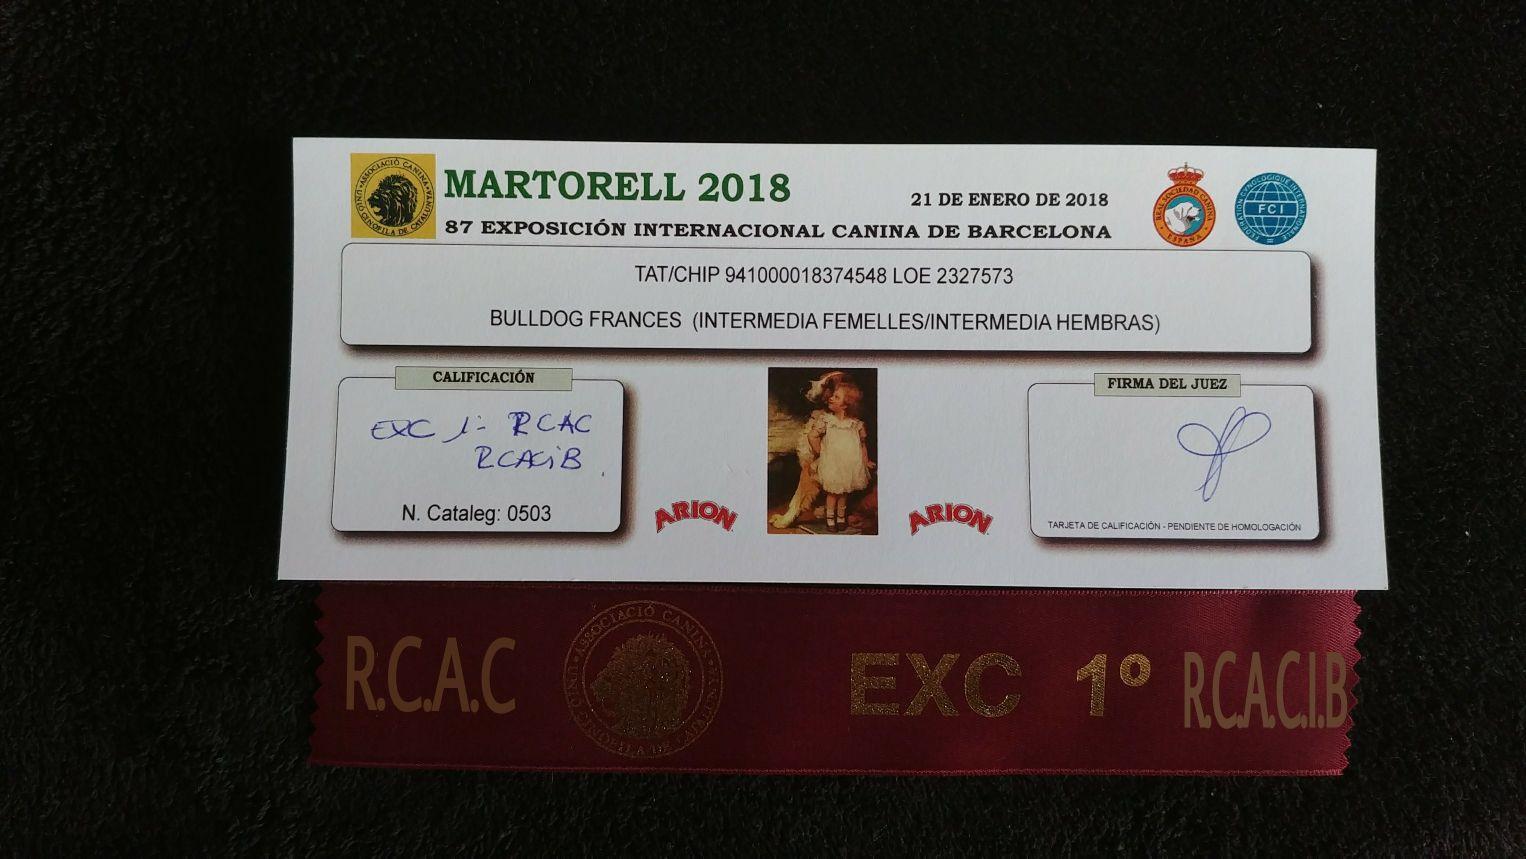 PARIS: EXC1 RCAC RCACIB MARTORELL INTERNACIONAL 2018